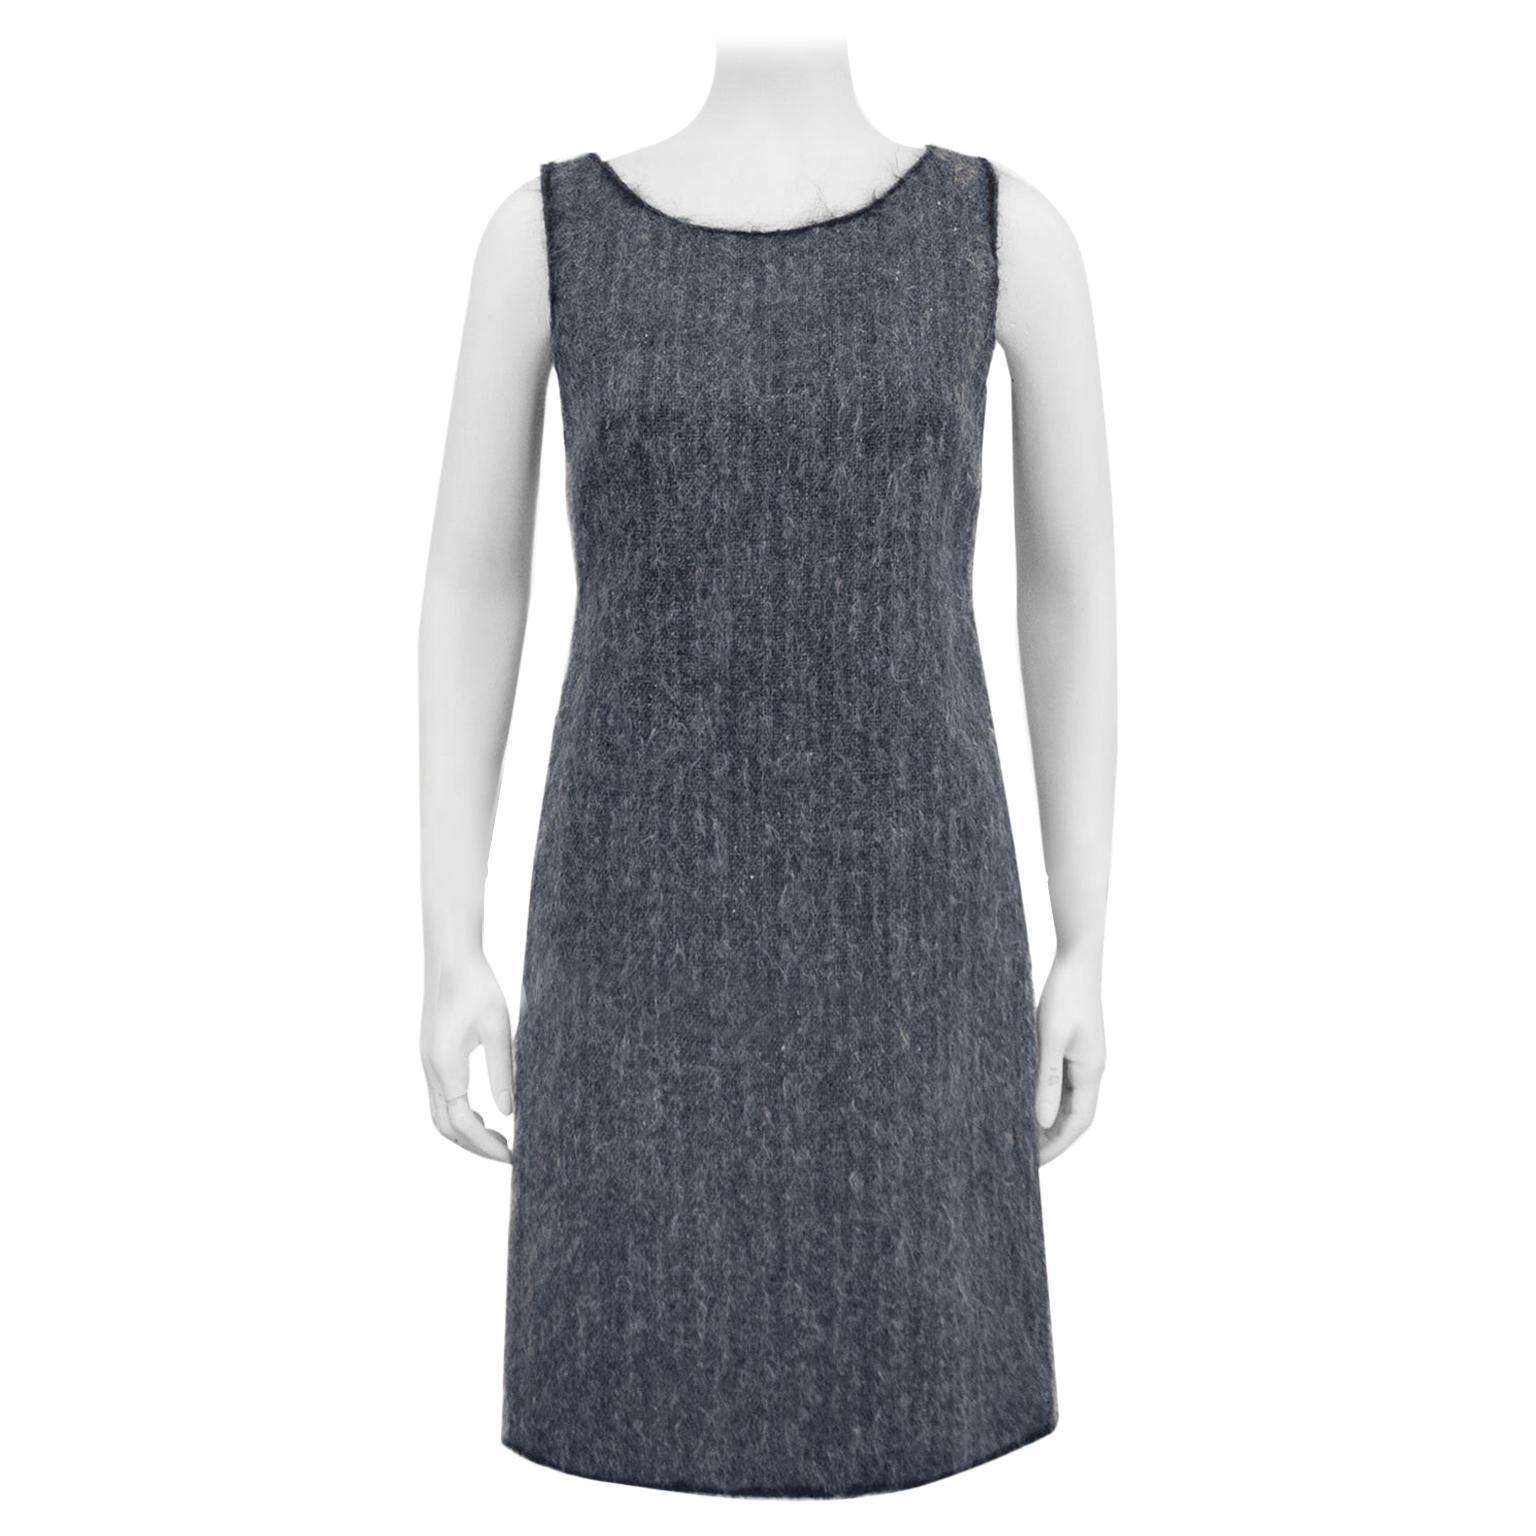 1990s Prada Grey Wool and Mohair Shift Dress